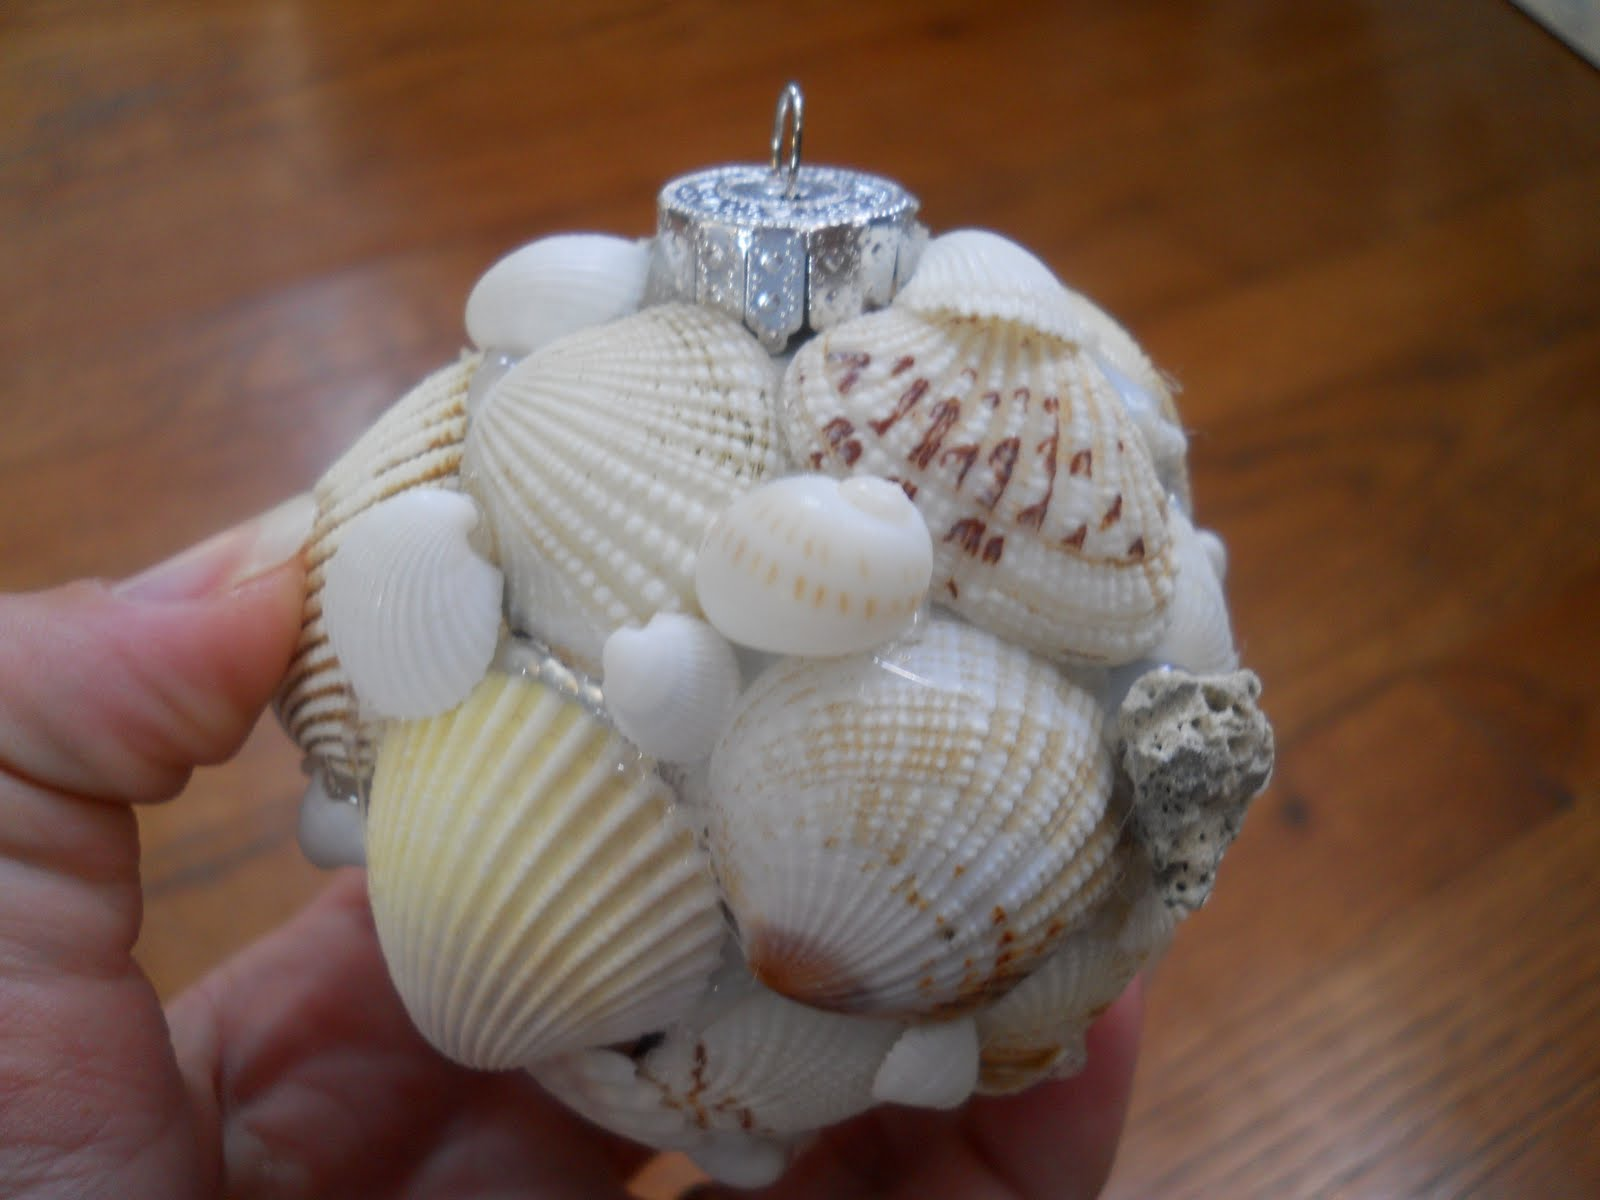 One woman 39 s walking shoes seashell christmas ornament for Seashell ornaments craft